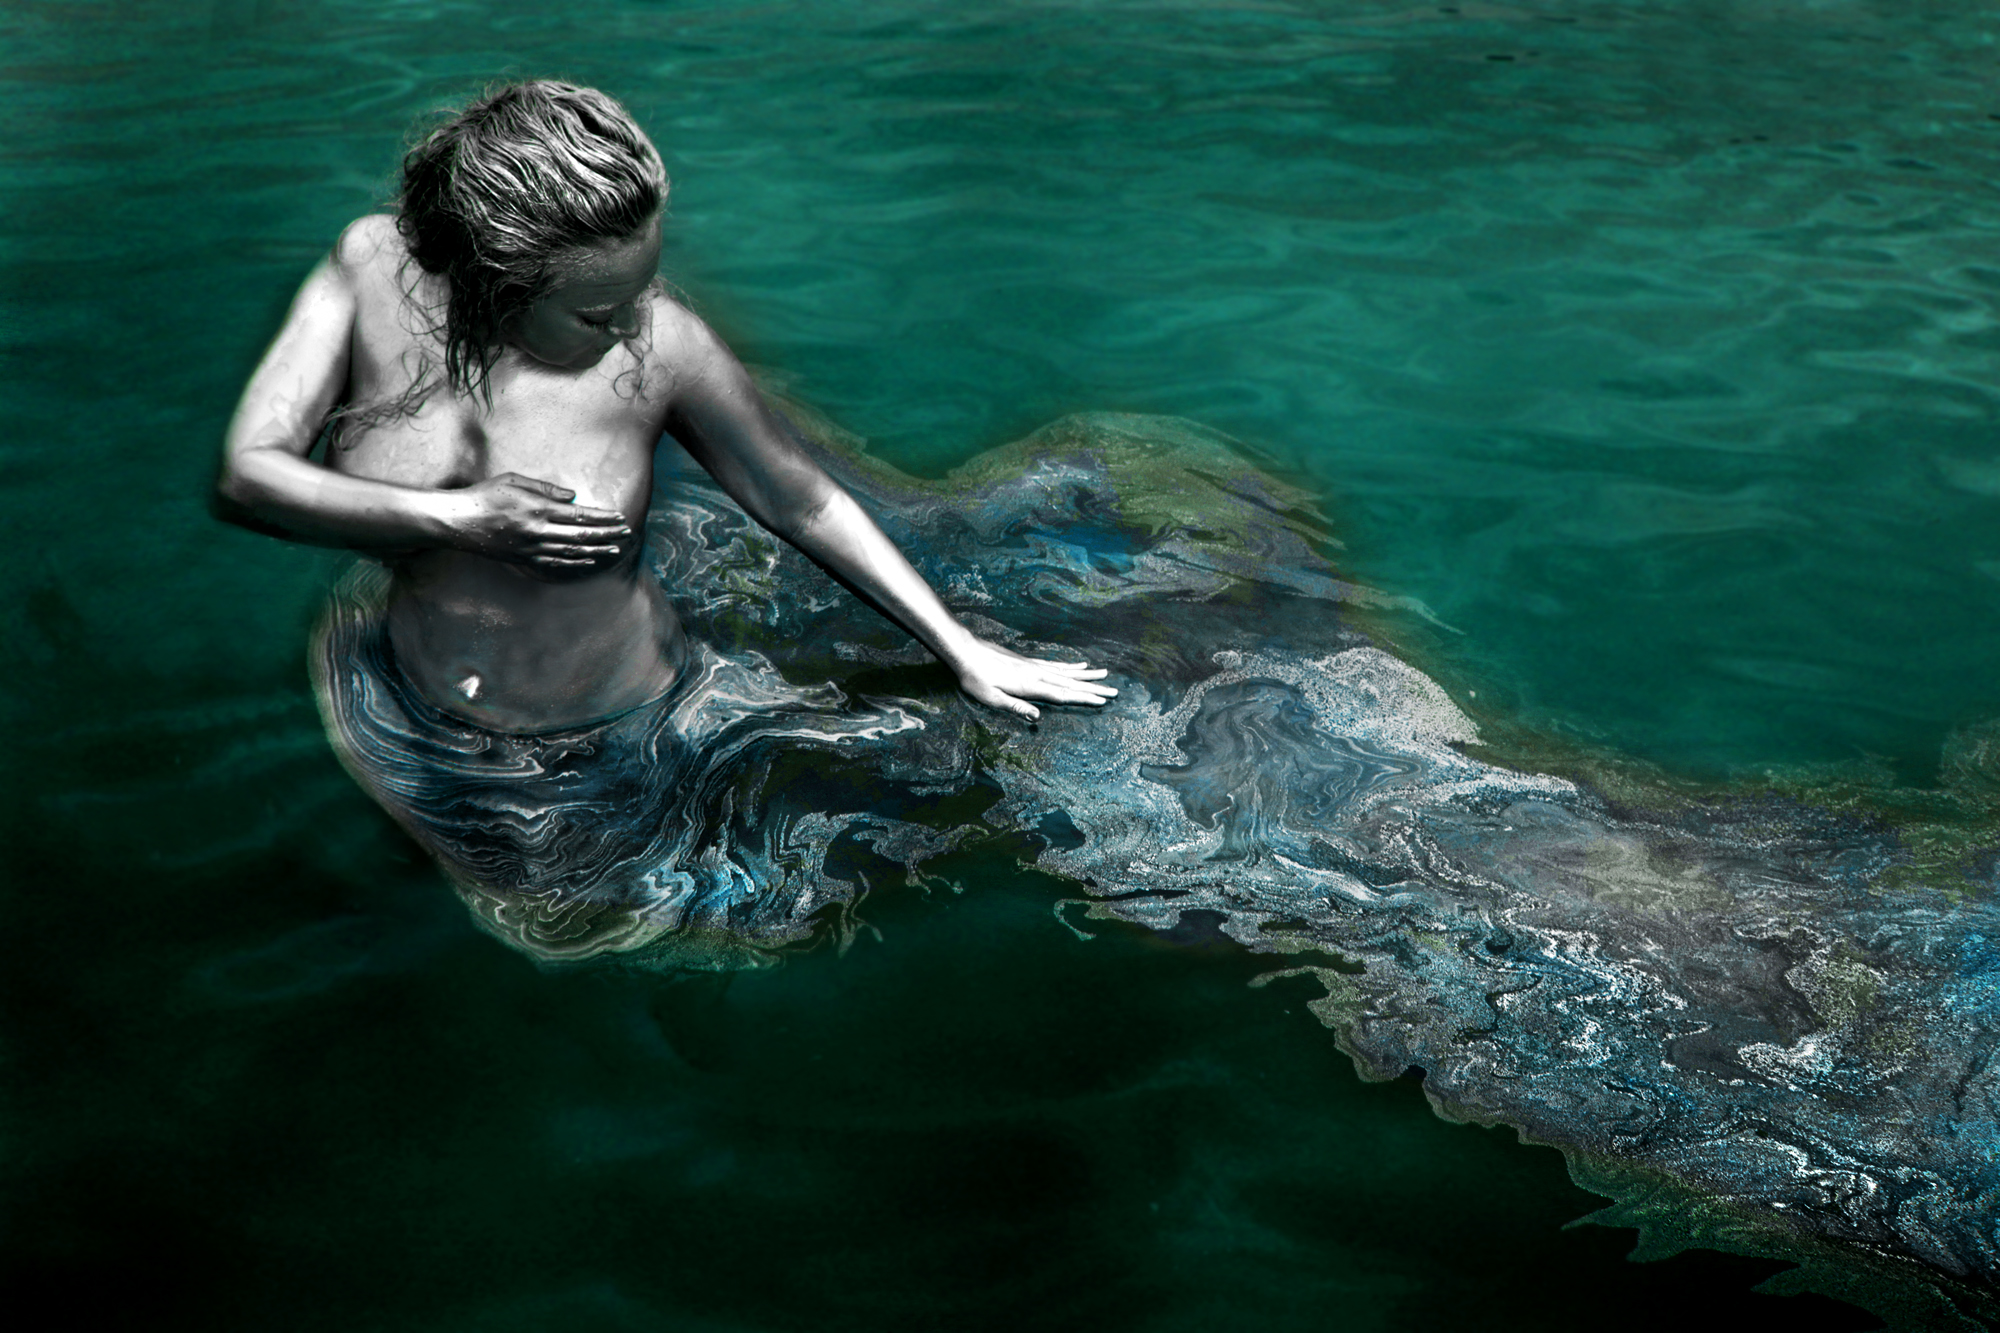 Dewayne Flowers - Amanda Lusk Colwell - body paint by photog